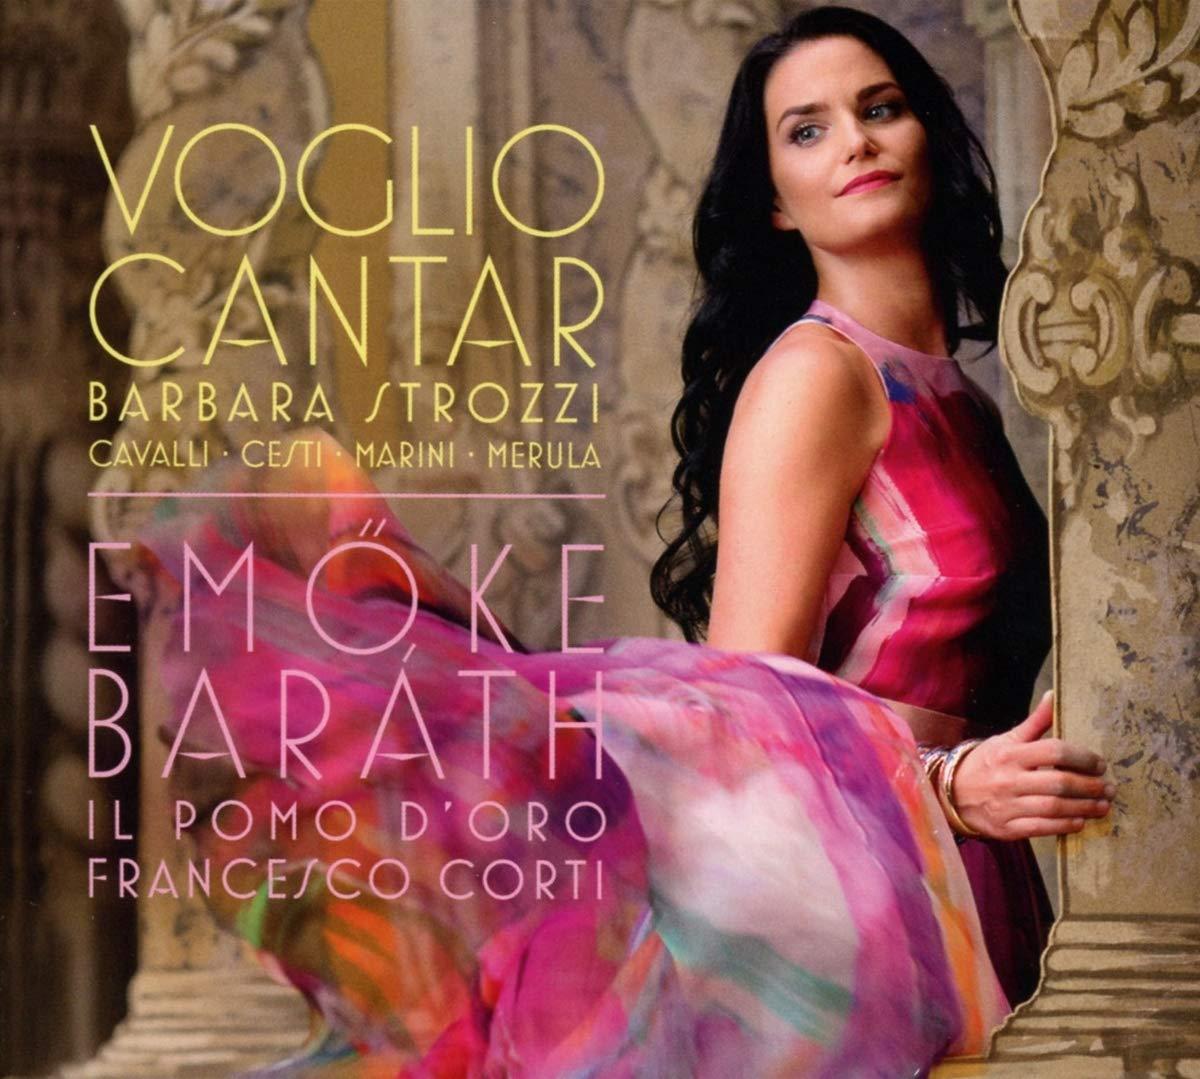 CD : Emoke Barath - Strozzi: Voglio Cantar (CD)